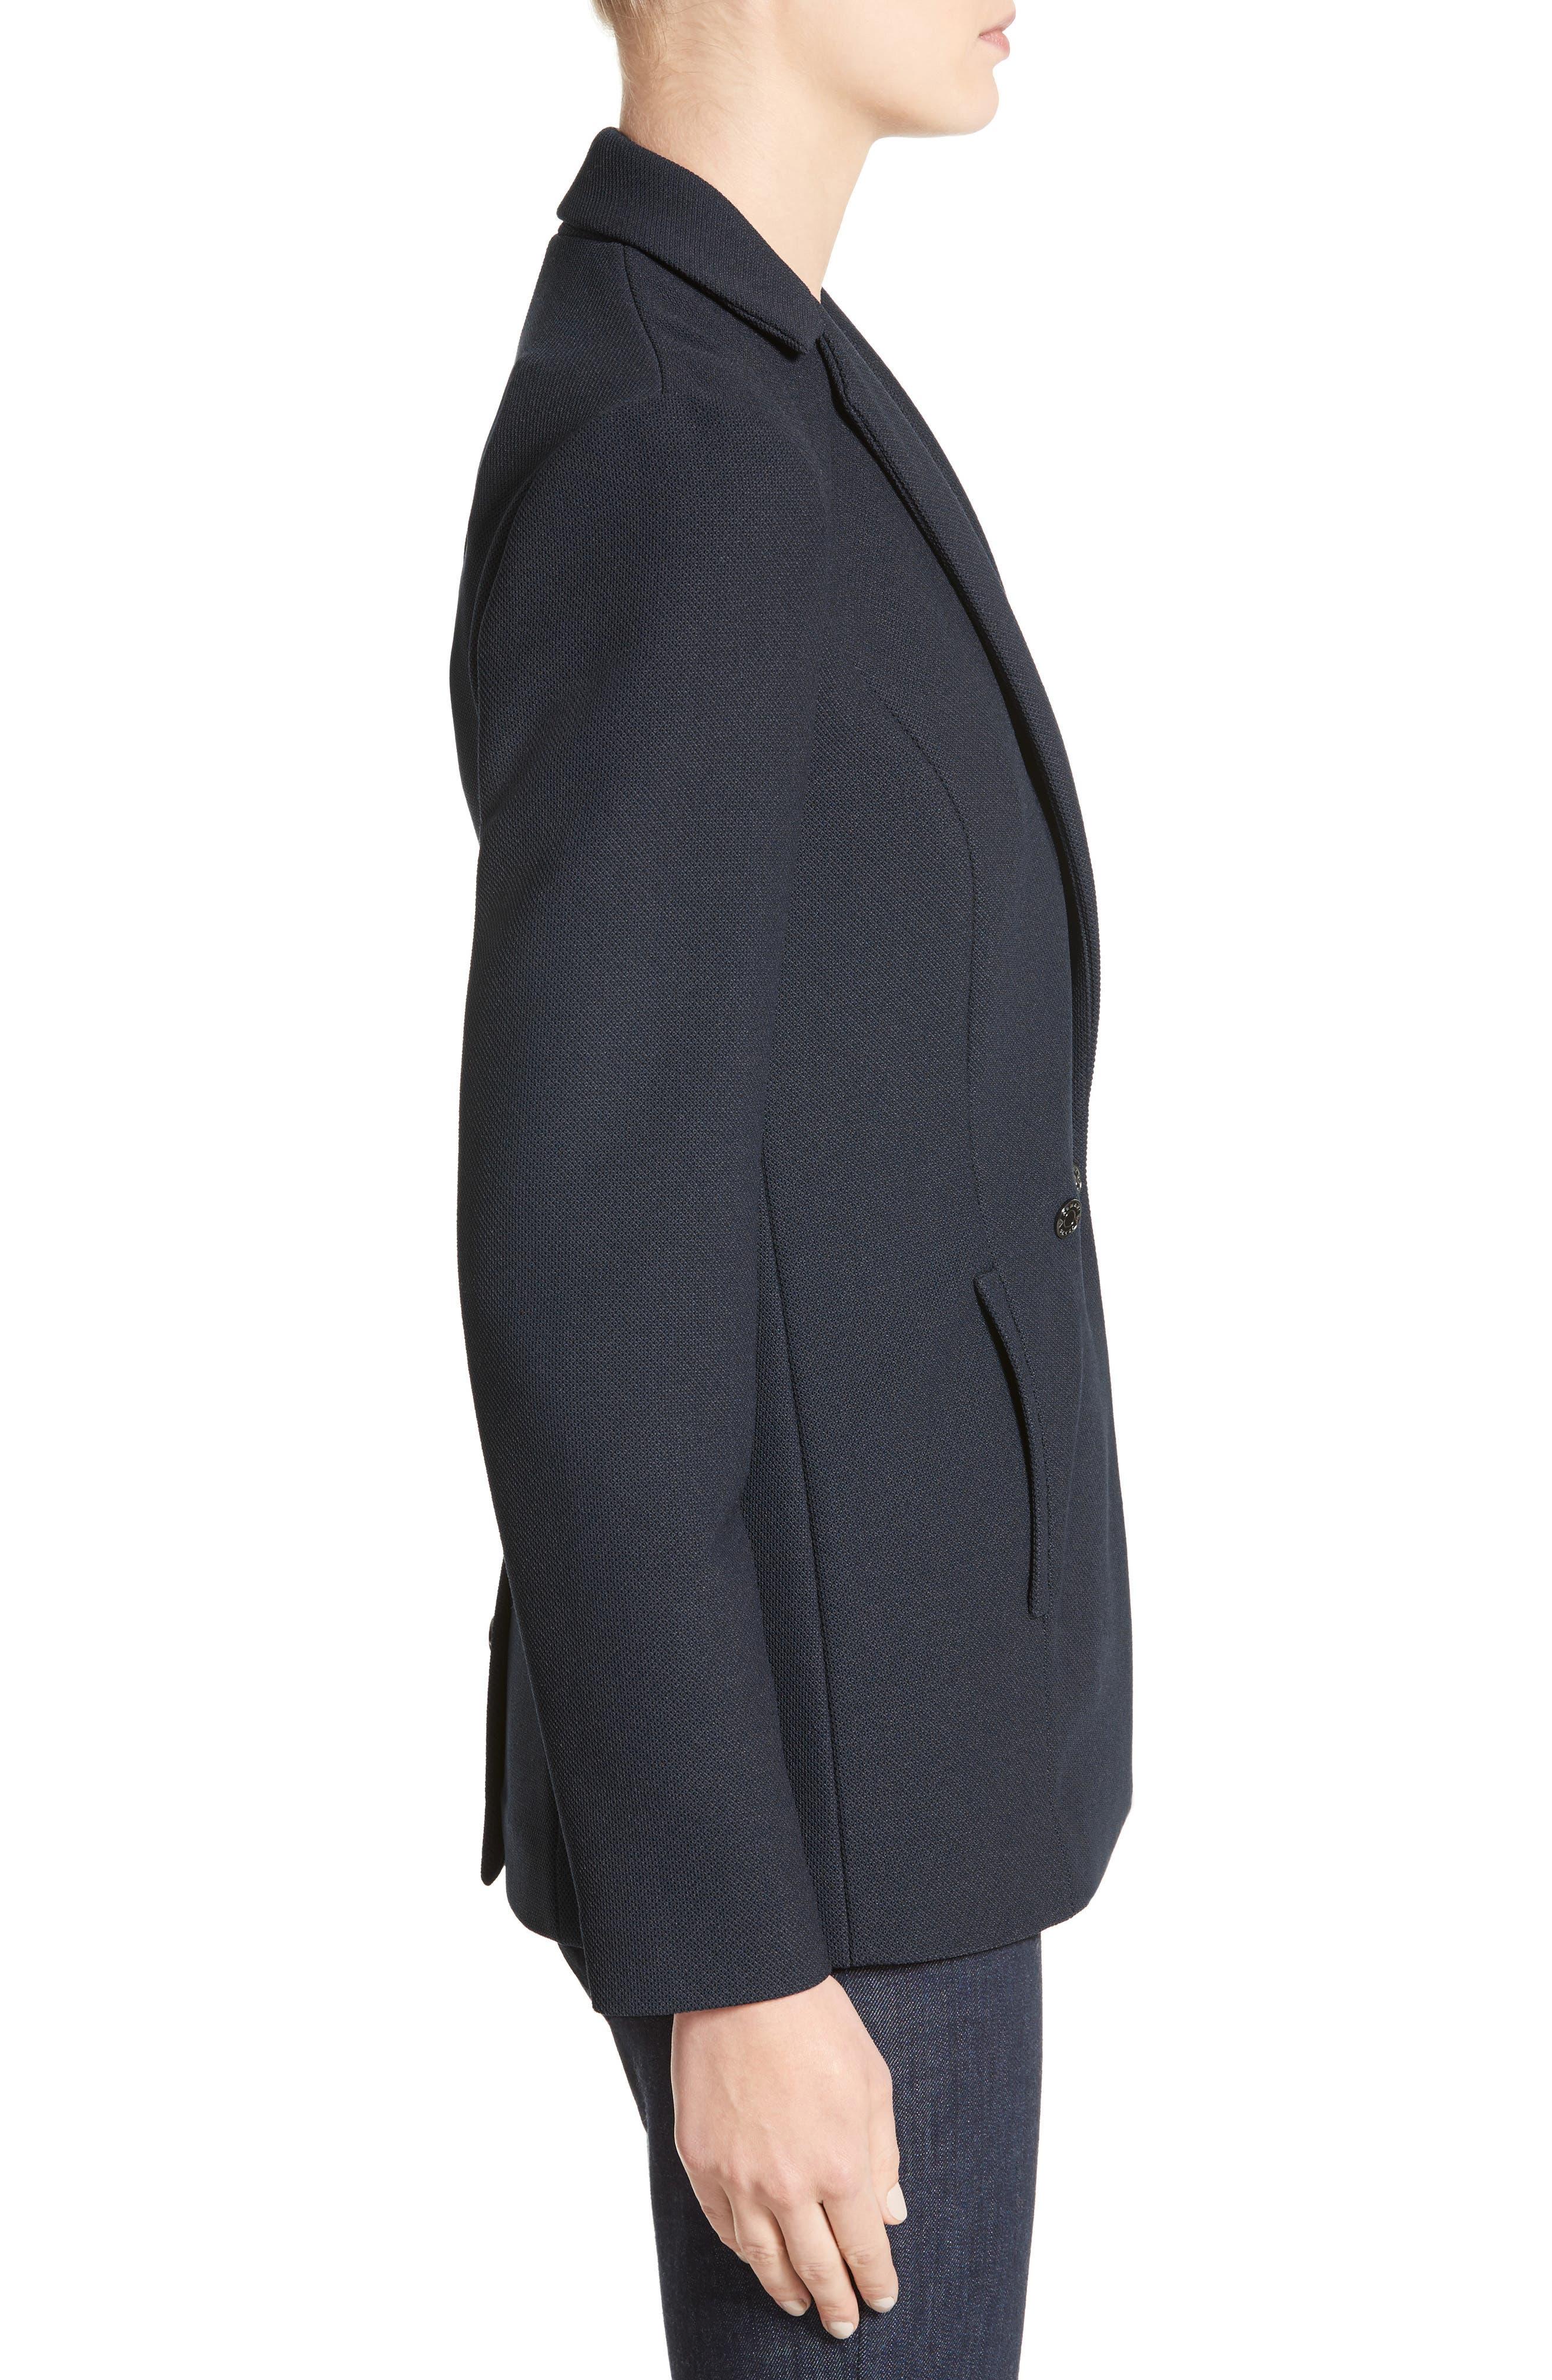 Armani Jeans Piqué Double Breasted Blazer,                             Alternate thumbnail 3, color,                             484